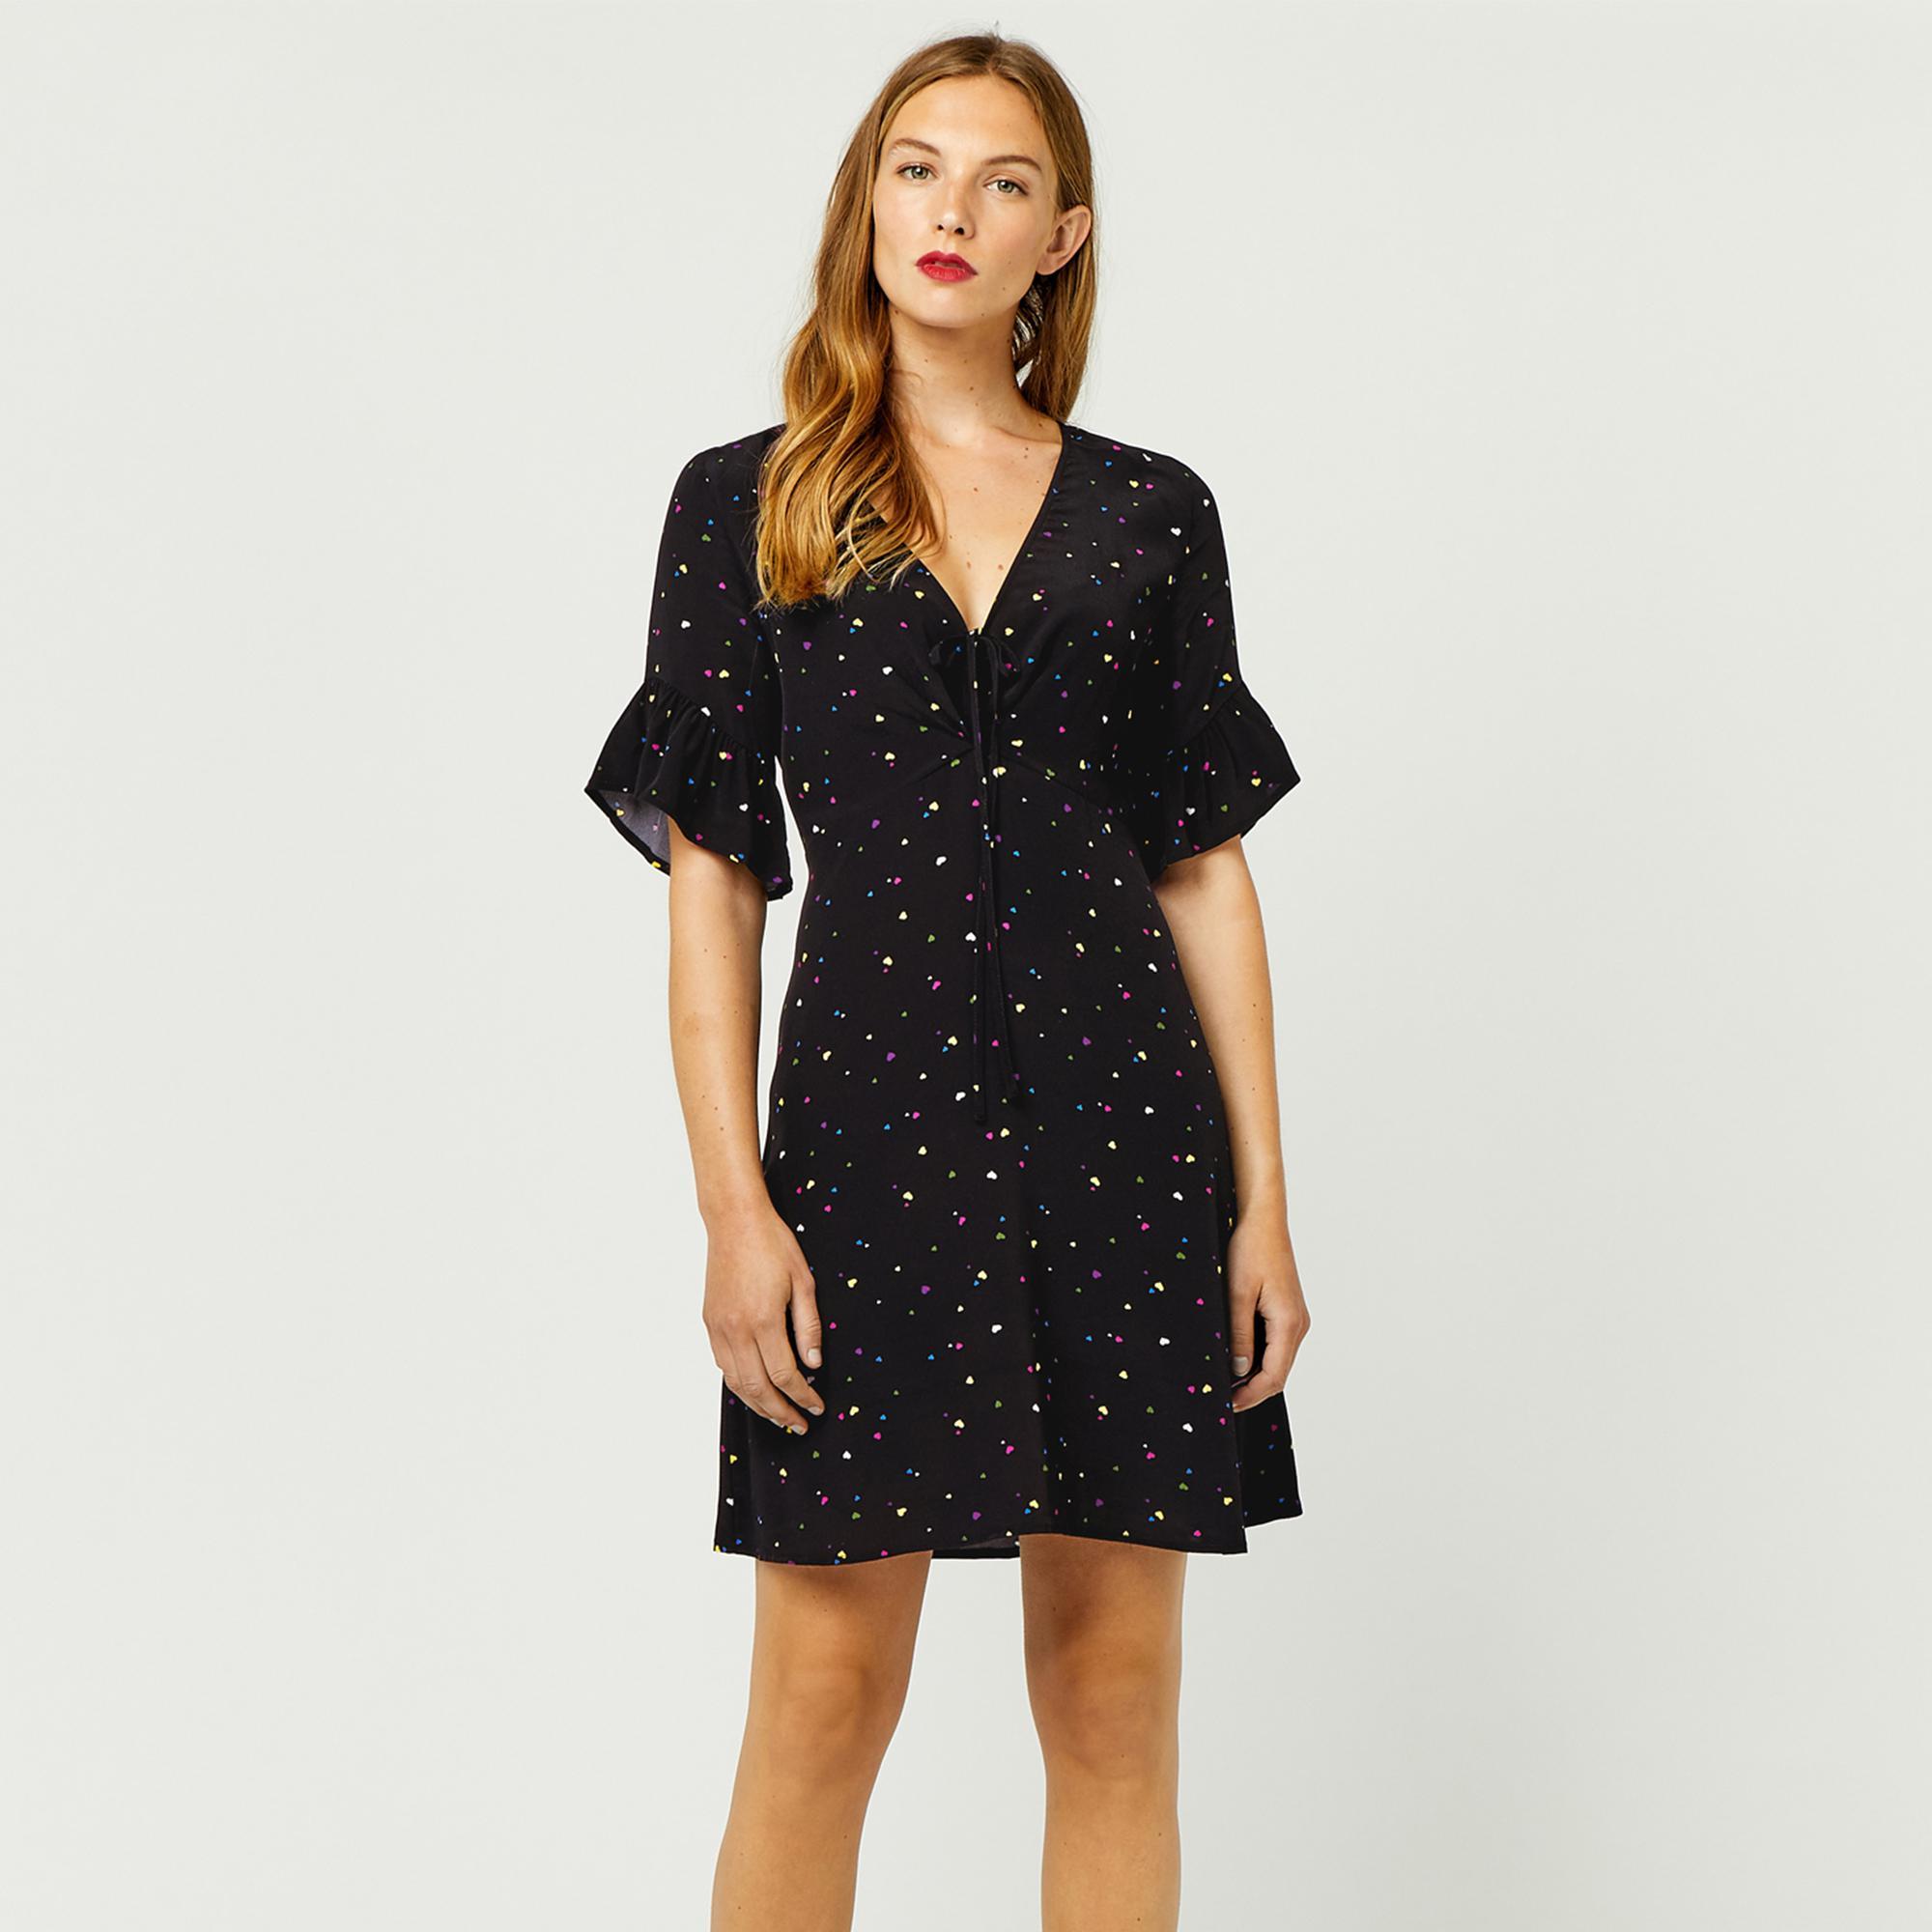 99344f47a9a2 Warehouse Heart Print Tea Dress in Black - Lyst